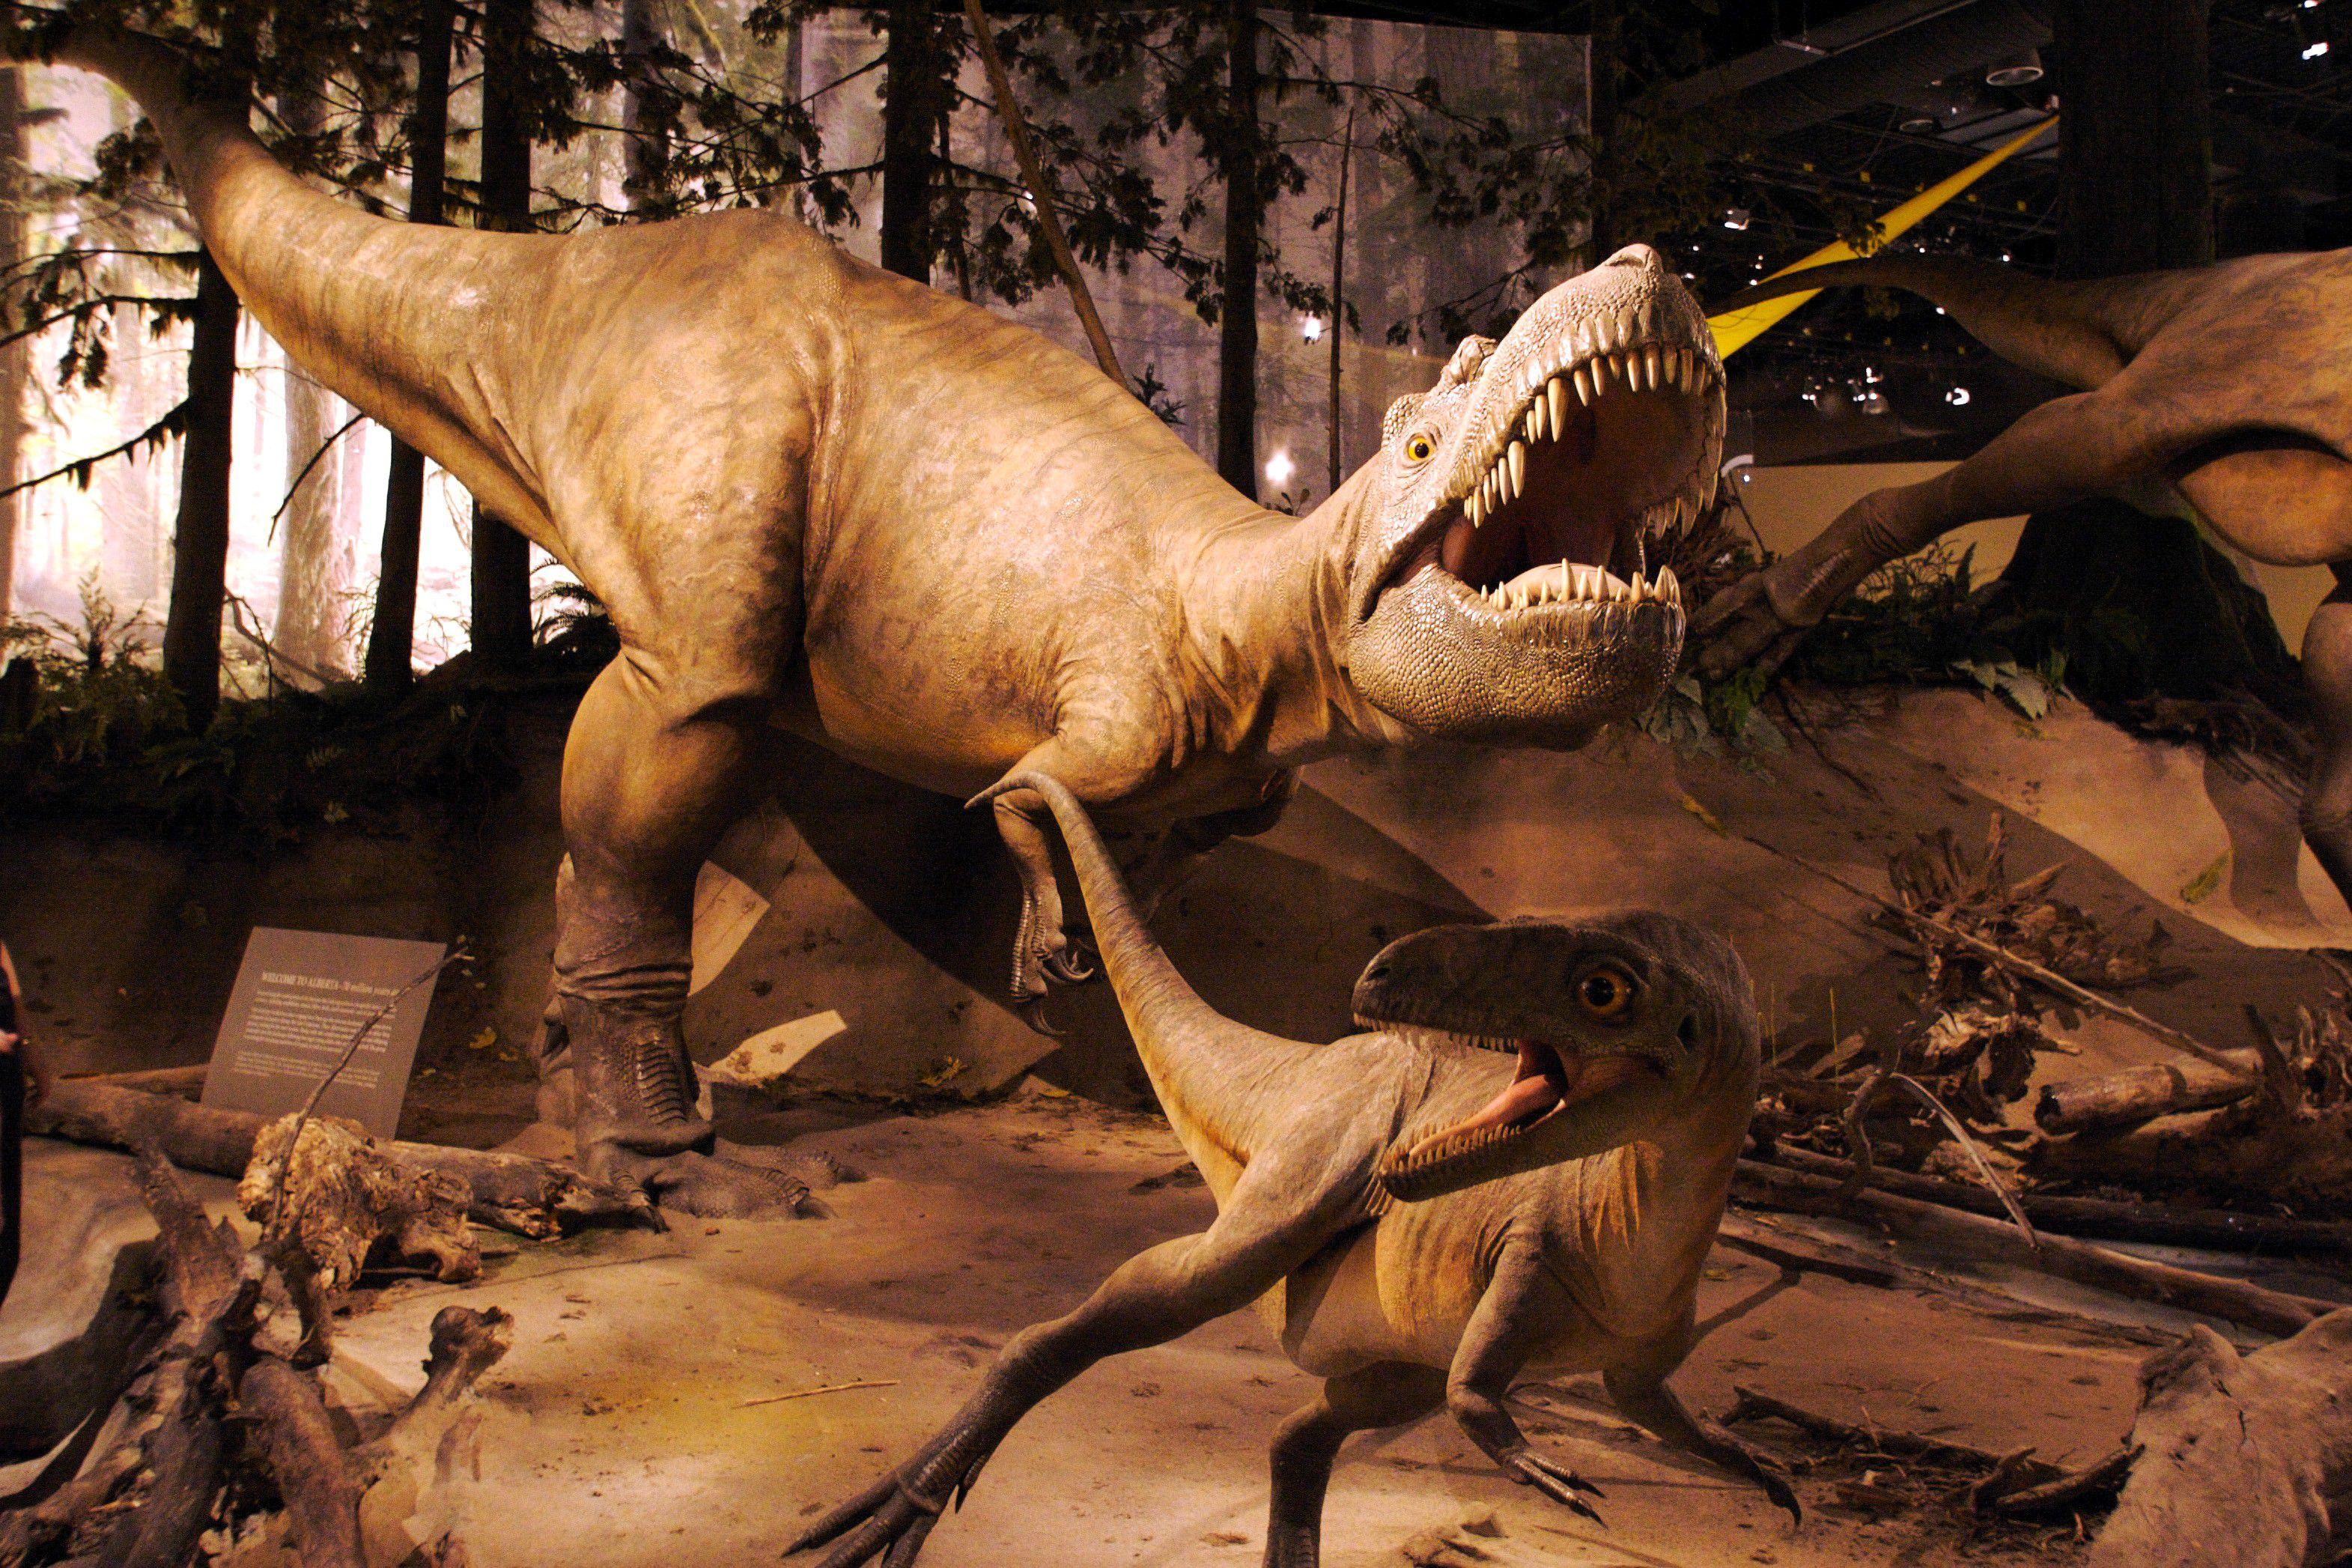 An albertosaurus model chasing after smaller dinosaurs